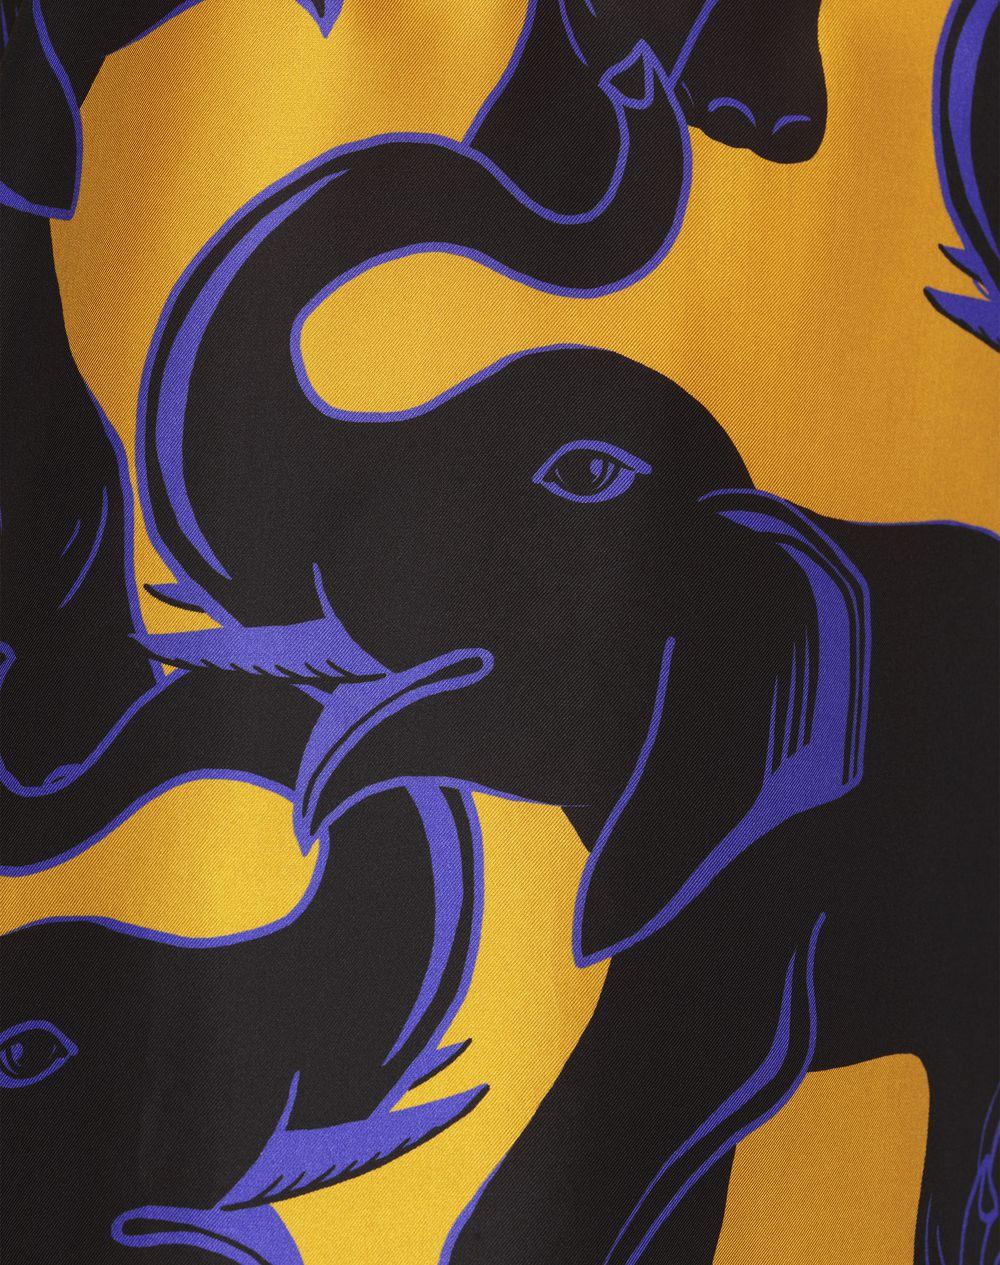 ELEPHANT-PRINT SILK TROUSERS - Lanvin